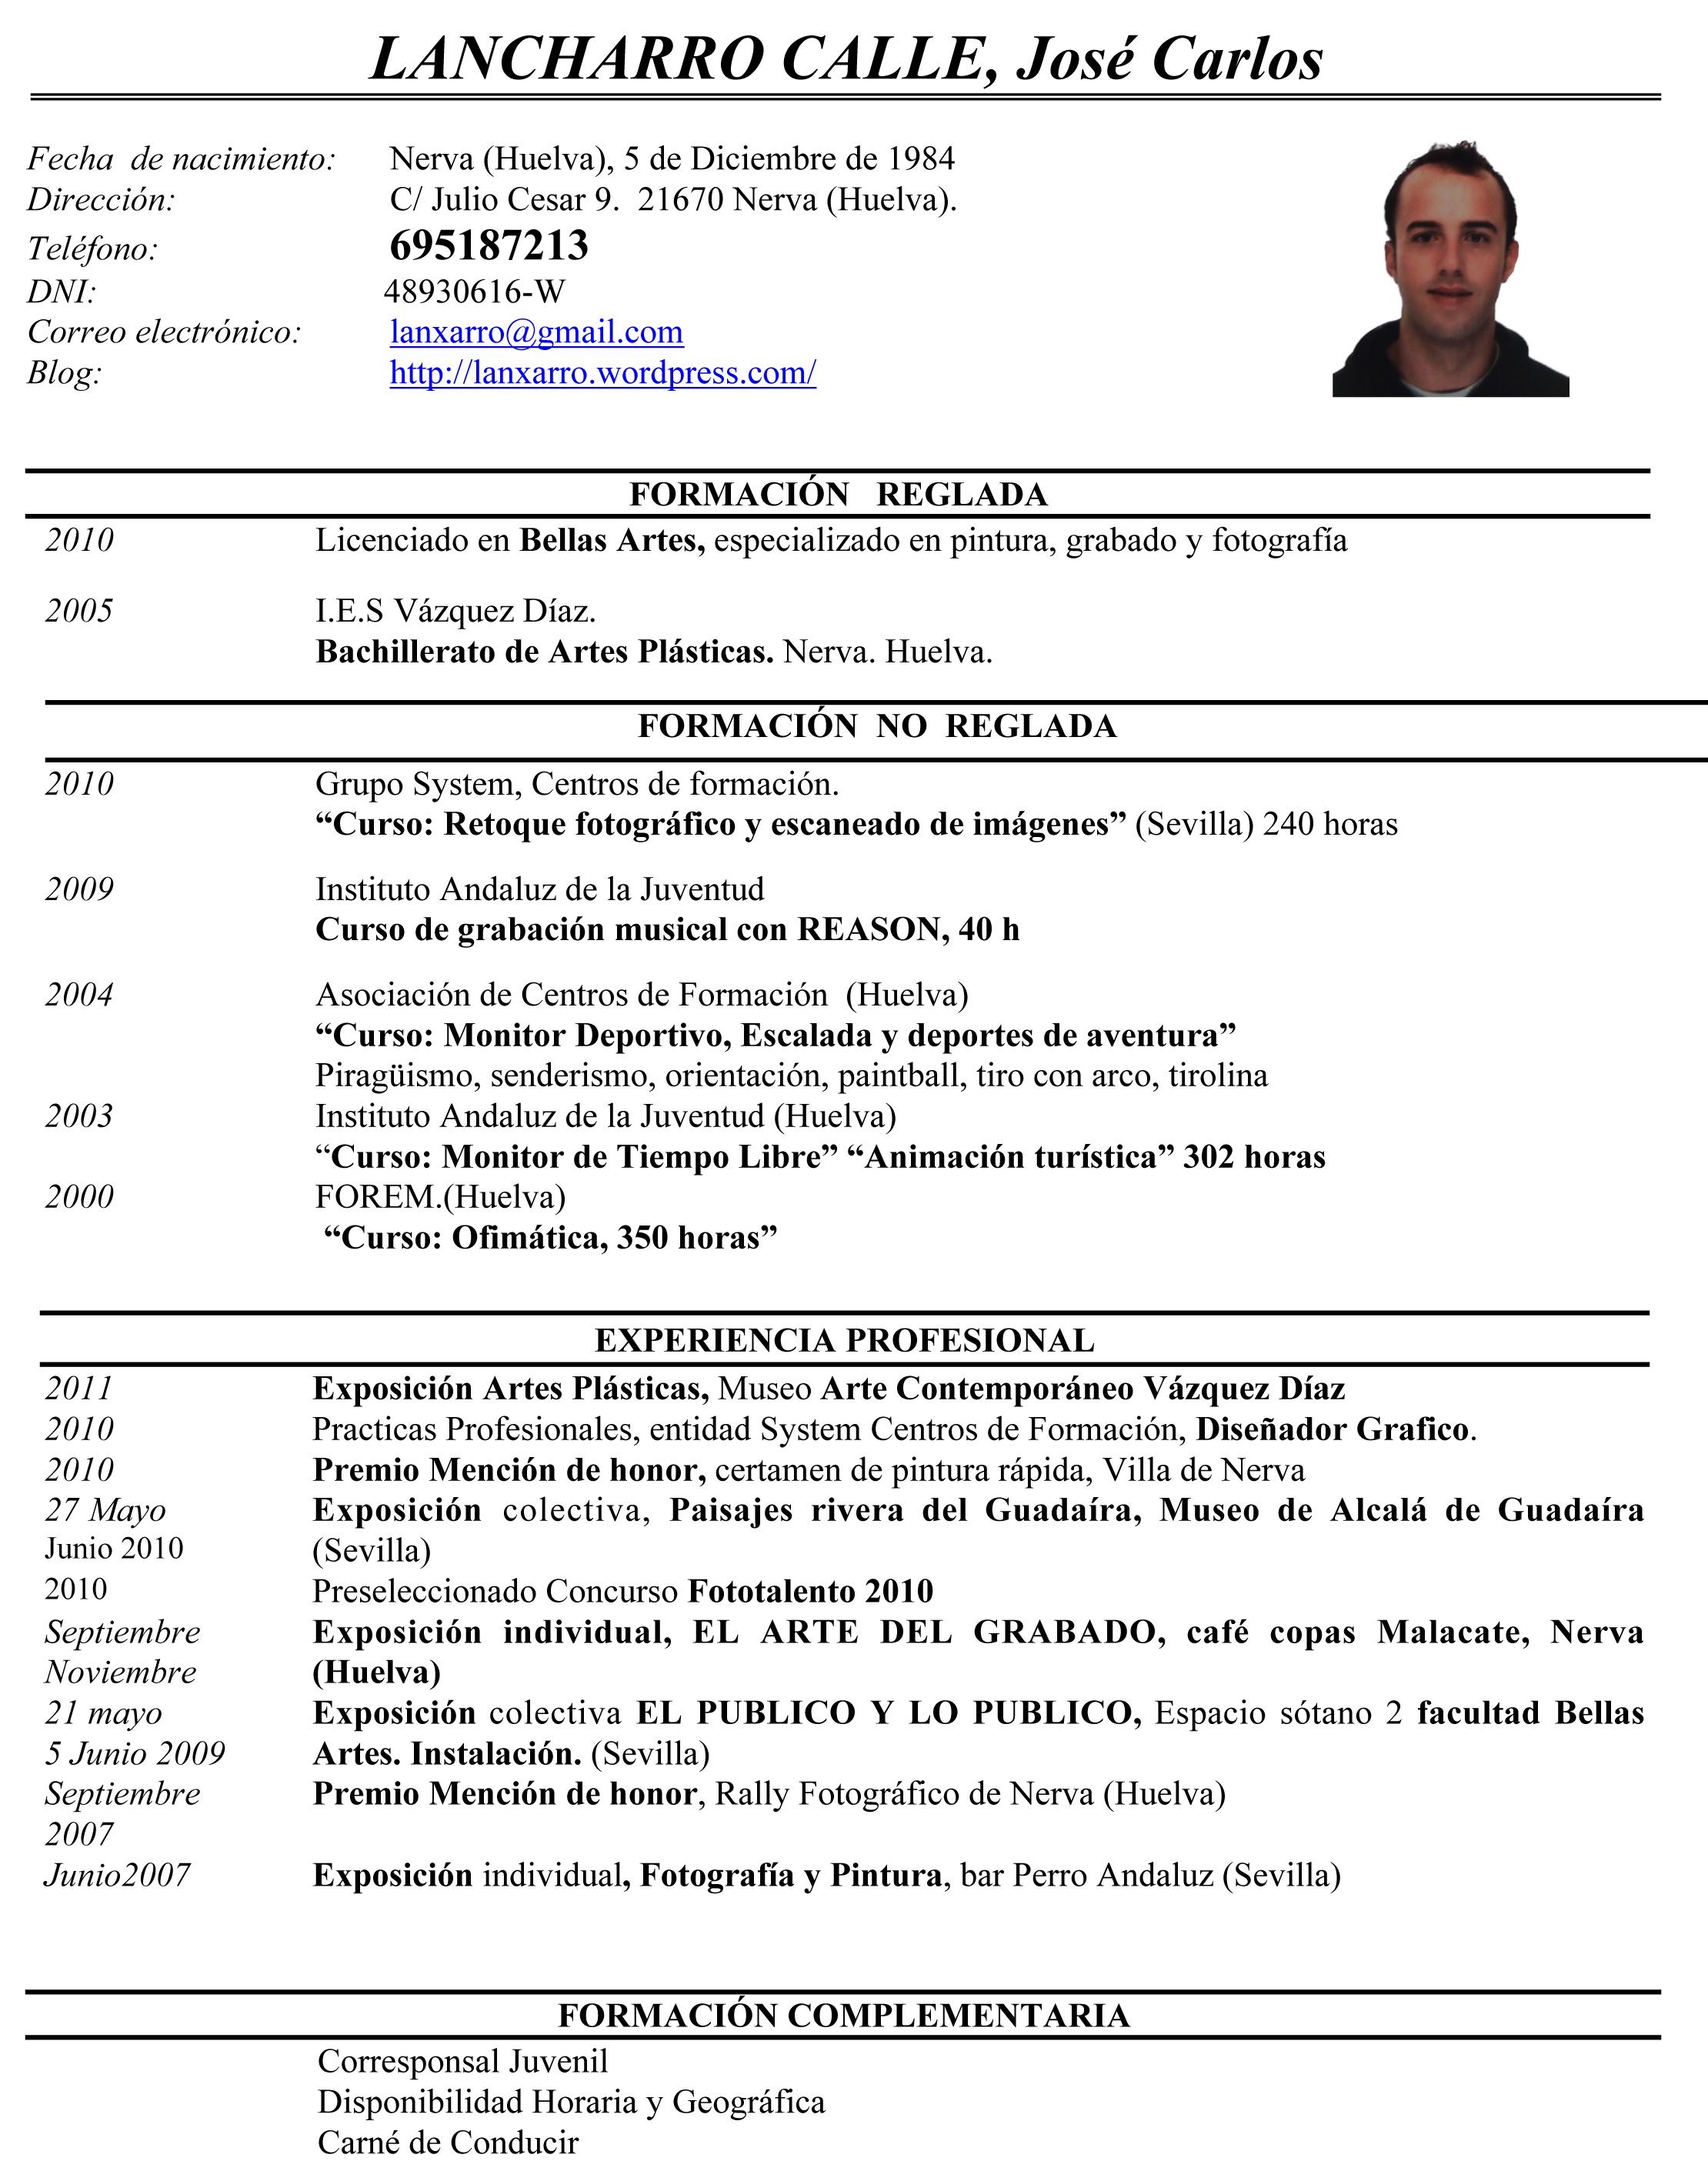 sample curriculum vitae it sample customer service resume sample curriculum vitae it curriculum vitae o cv found at lanxarrowordpresscv 2cv lancharro artistico 4